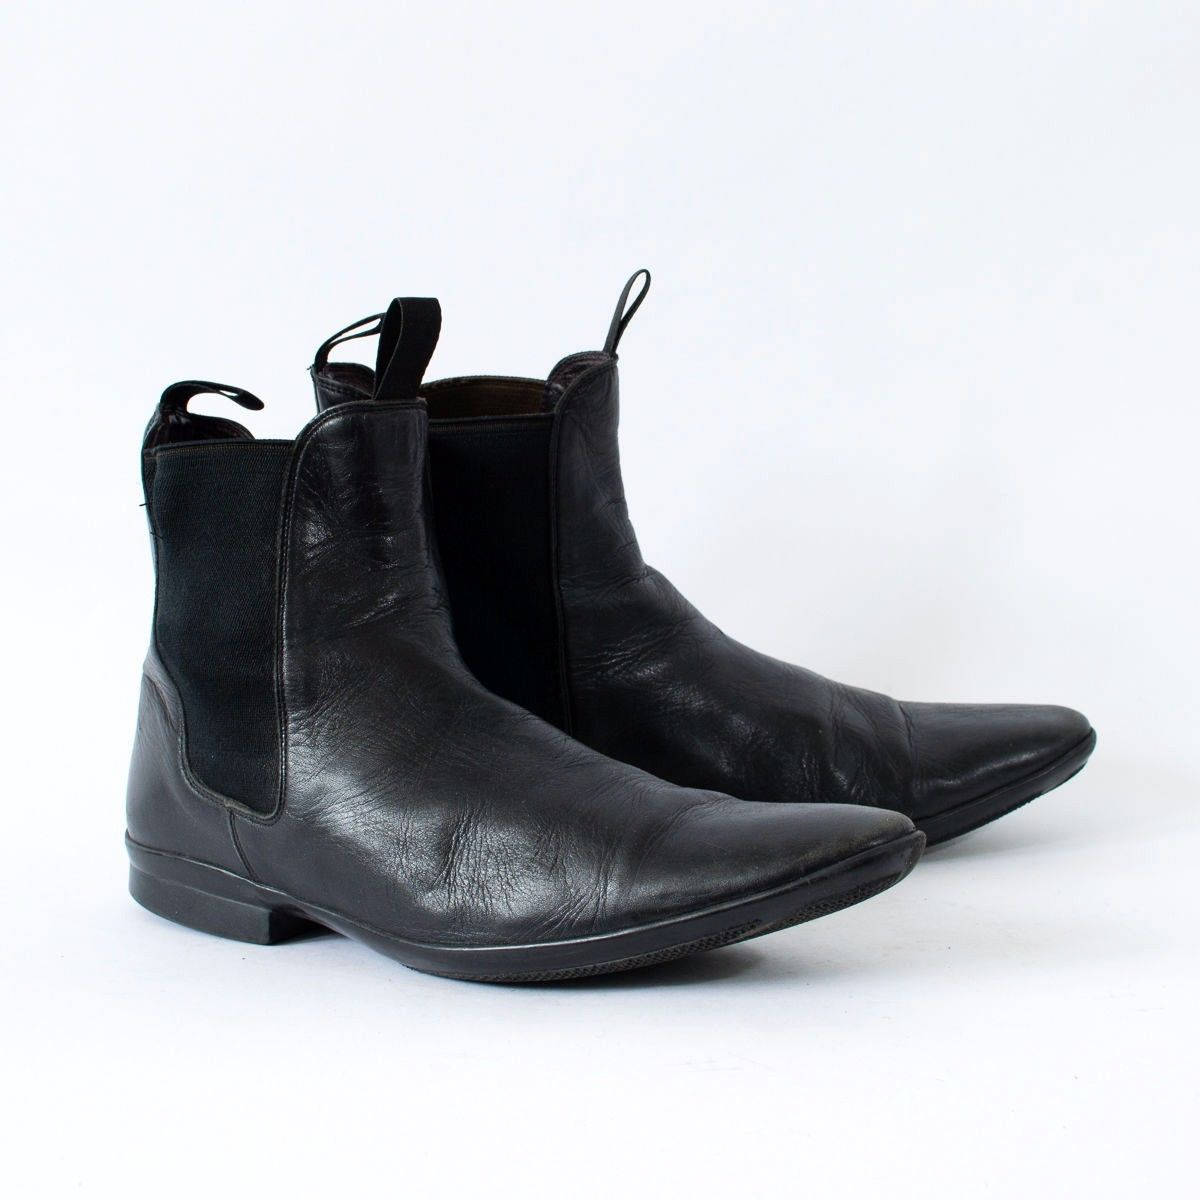 Vintage Black Real Leather Chelsea Boots Festival Mens UK 8 EU 42 US 9